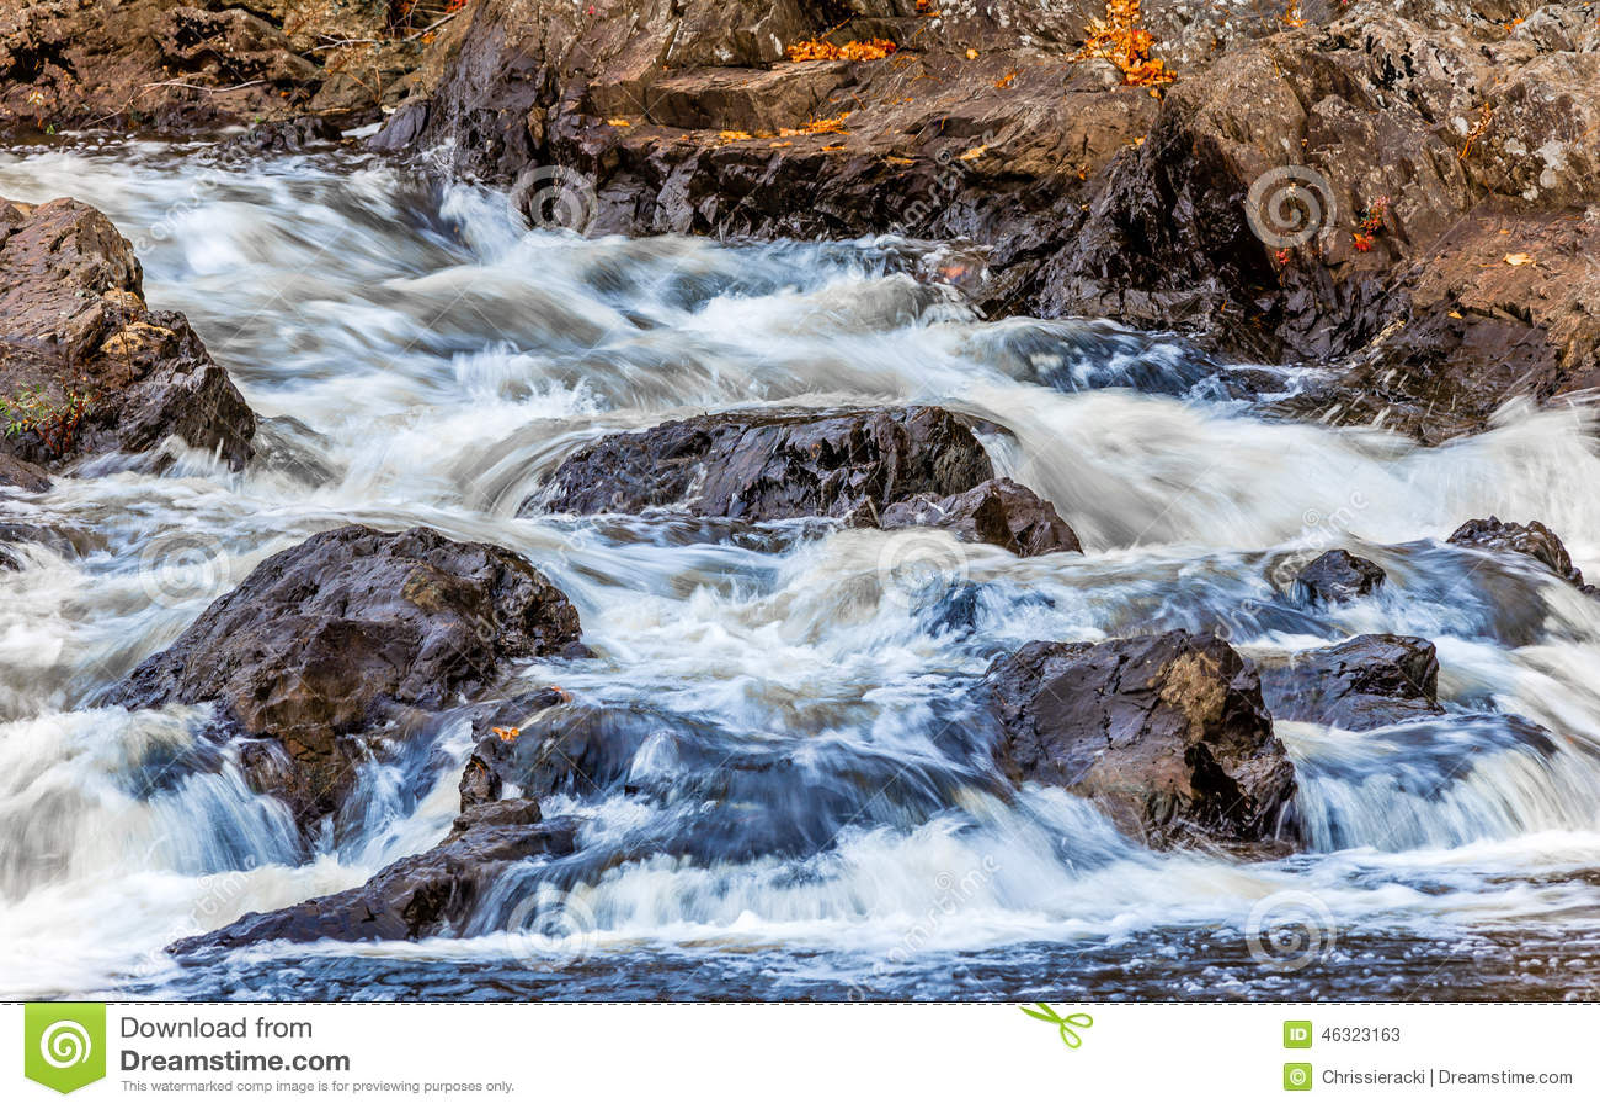 Krascha vatten i ström